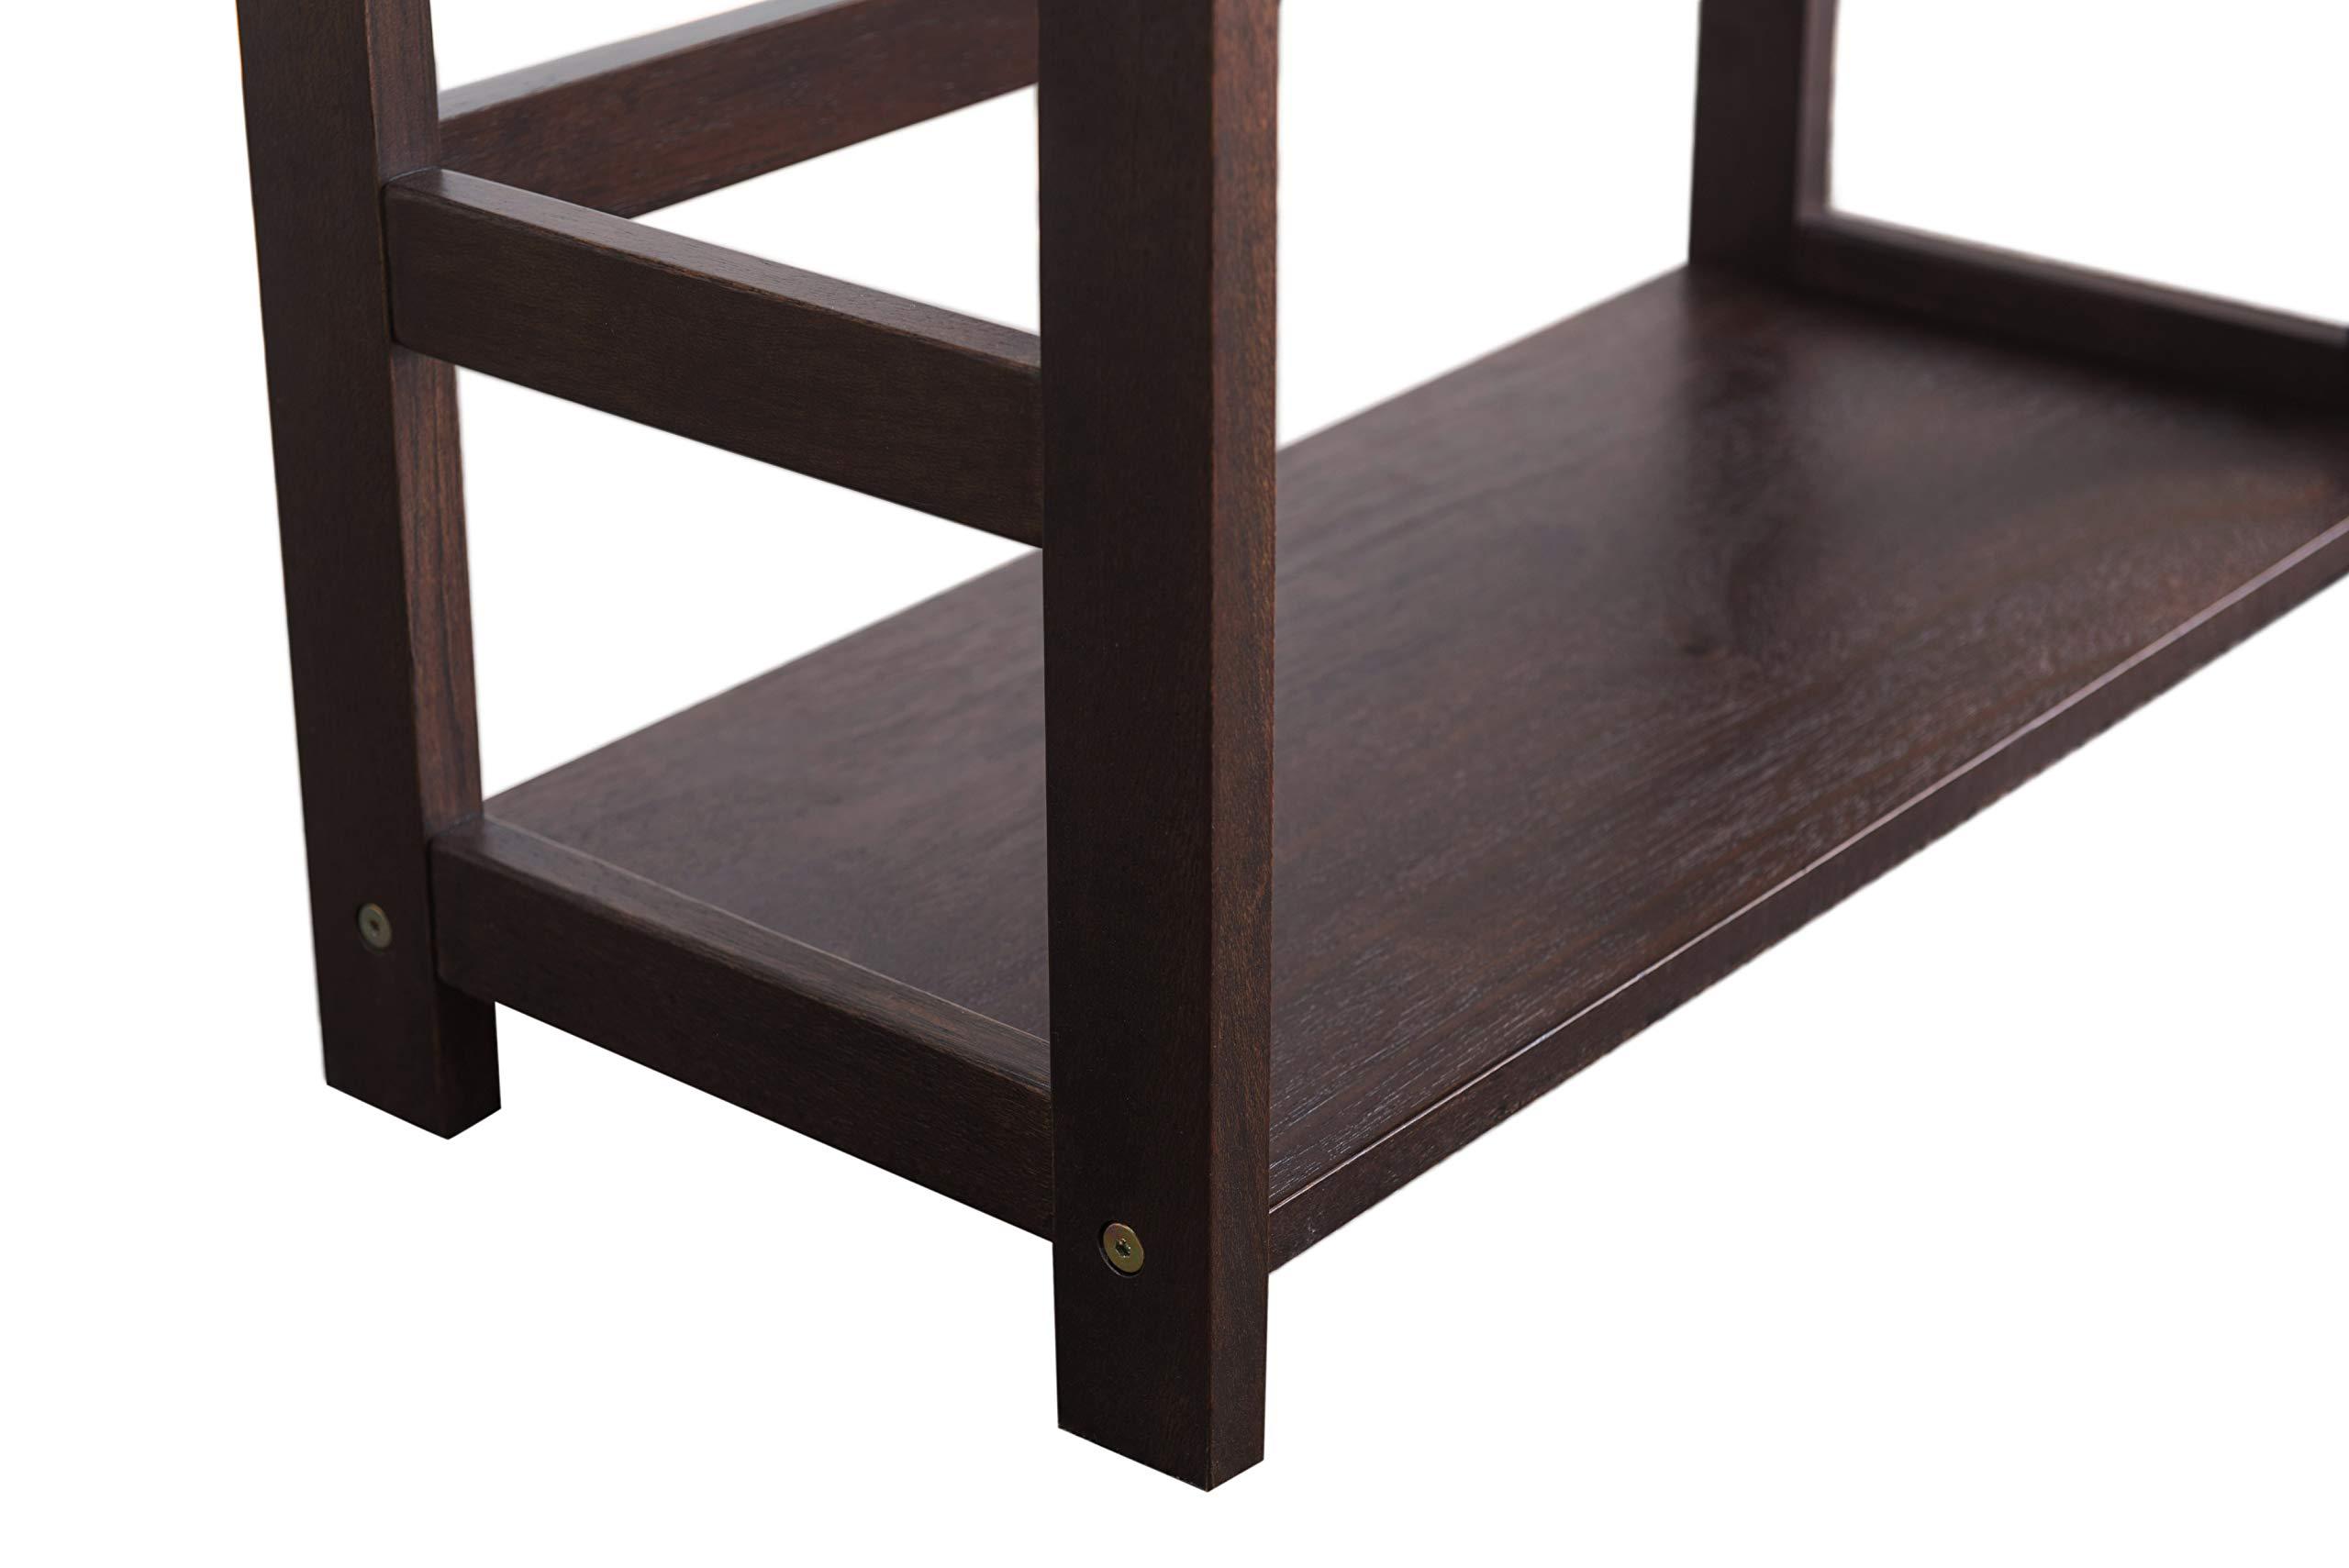 2L Lifestyle Hyder Everyday Basic Bookshelf Storage Rack Wood Shelf, Small, Brown by 2L Lifestyle (Image #7)